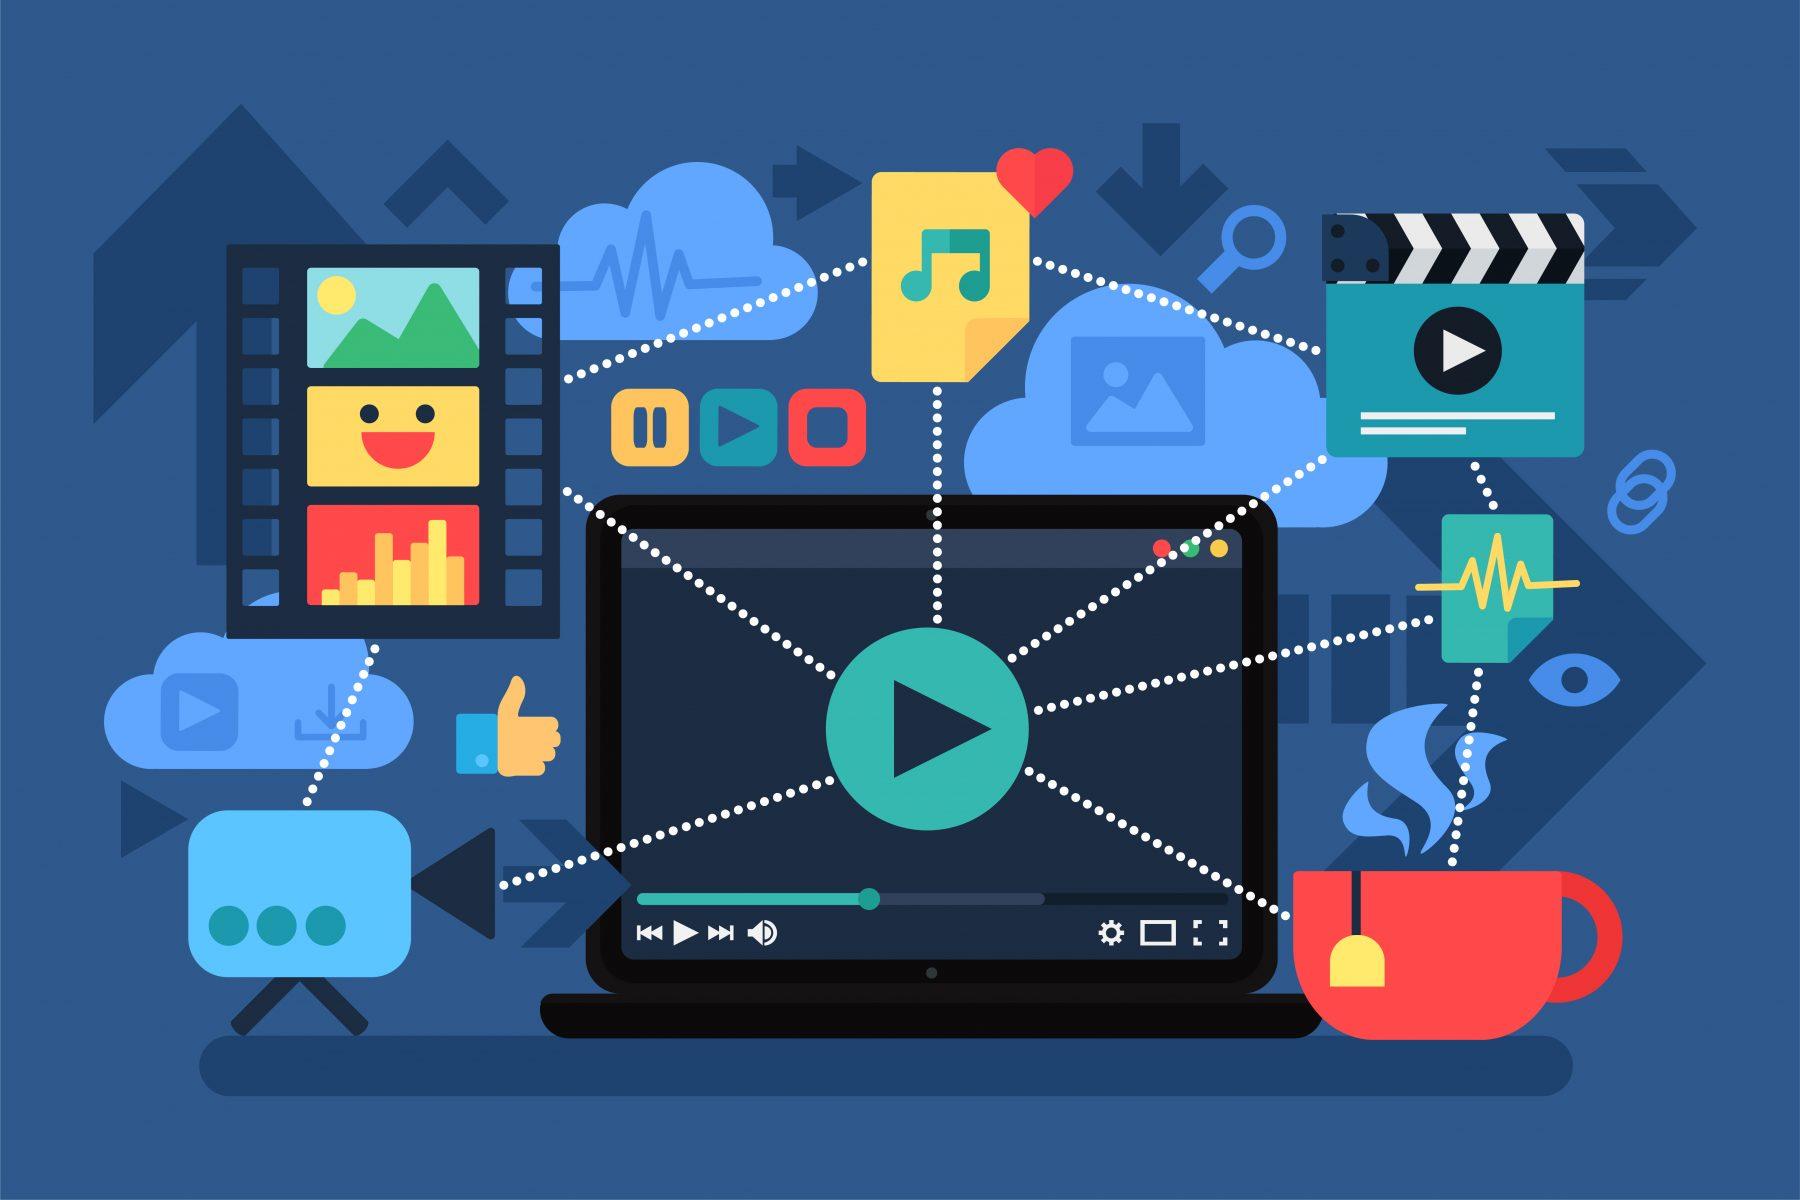 Marketing DAM - 5 reasons why marketing needs a DAM | Daminion Blog